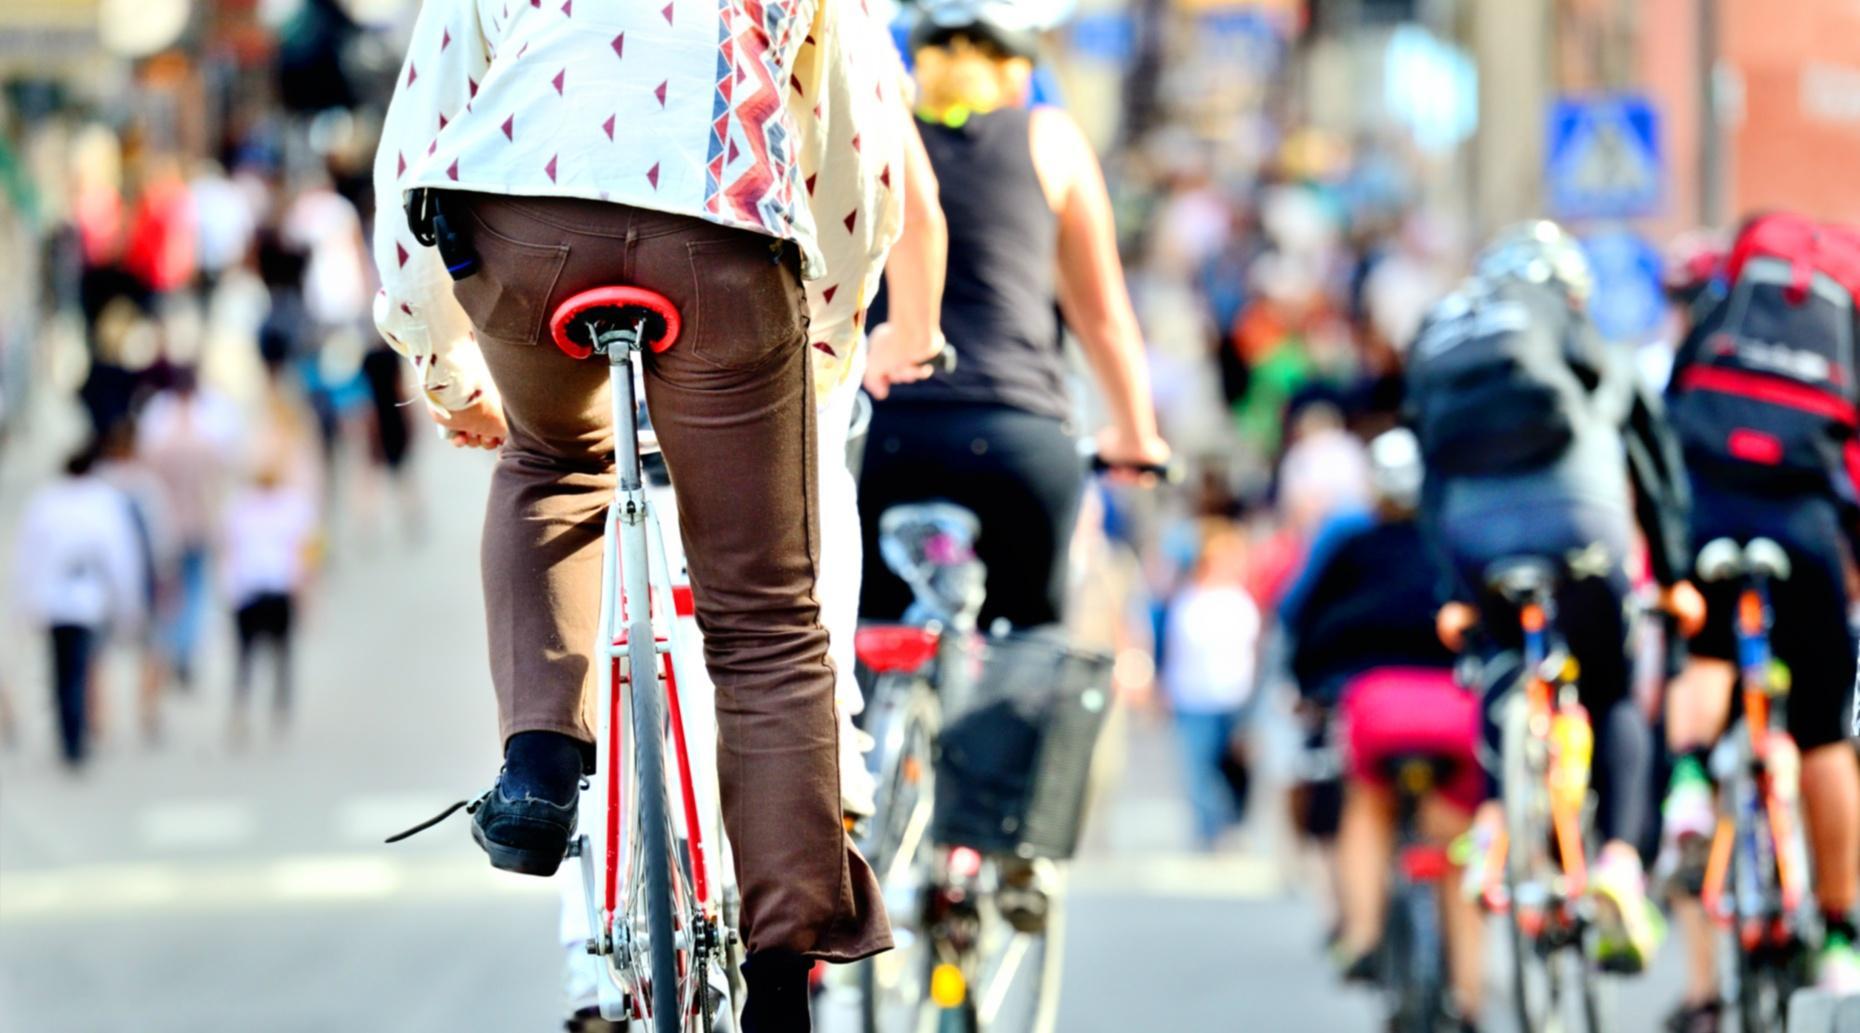 Menomonee Valley Bike Tour in Milwaukee